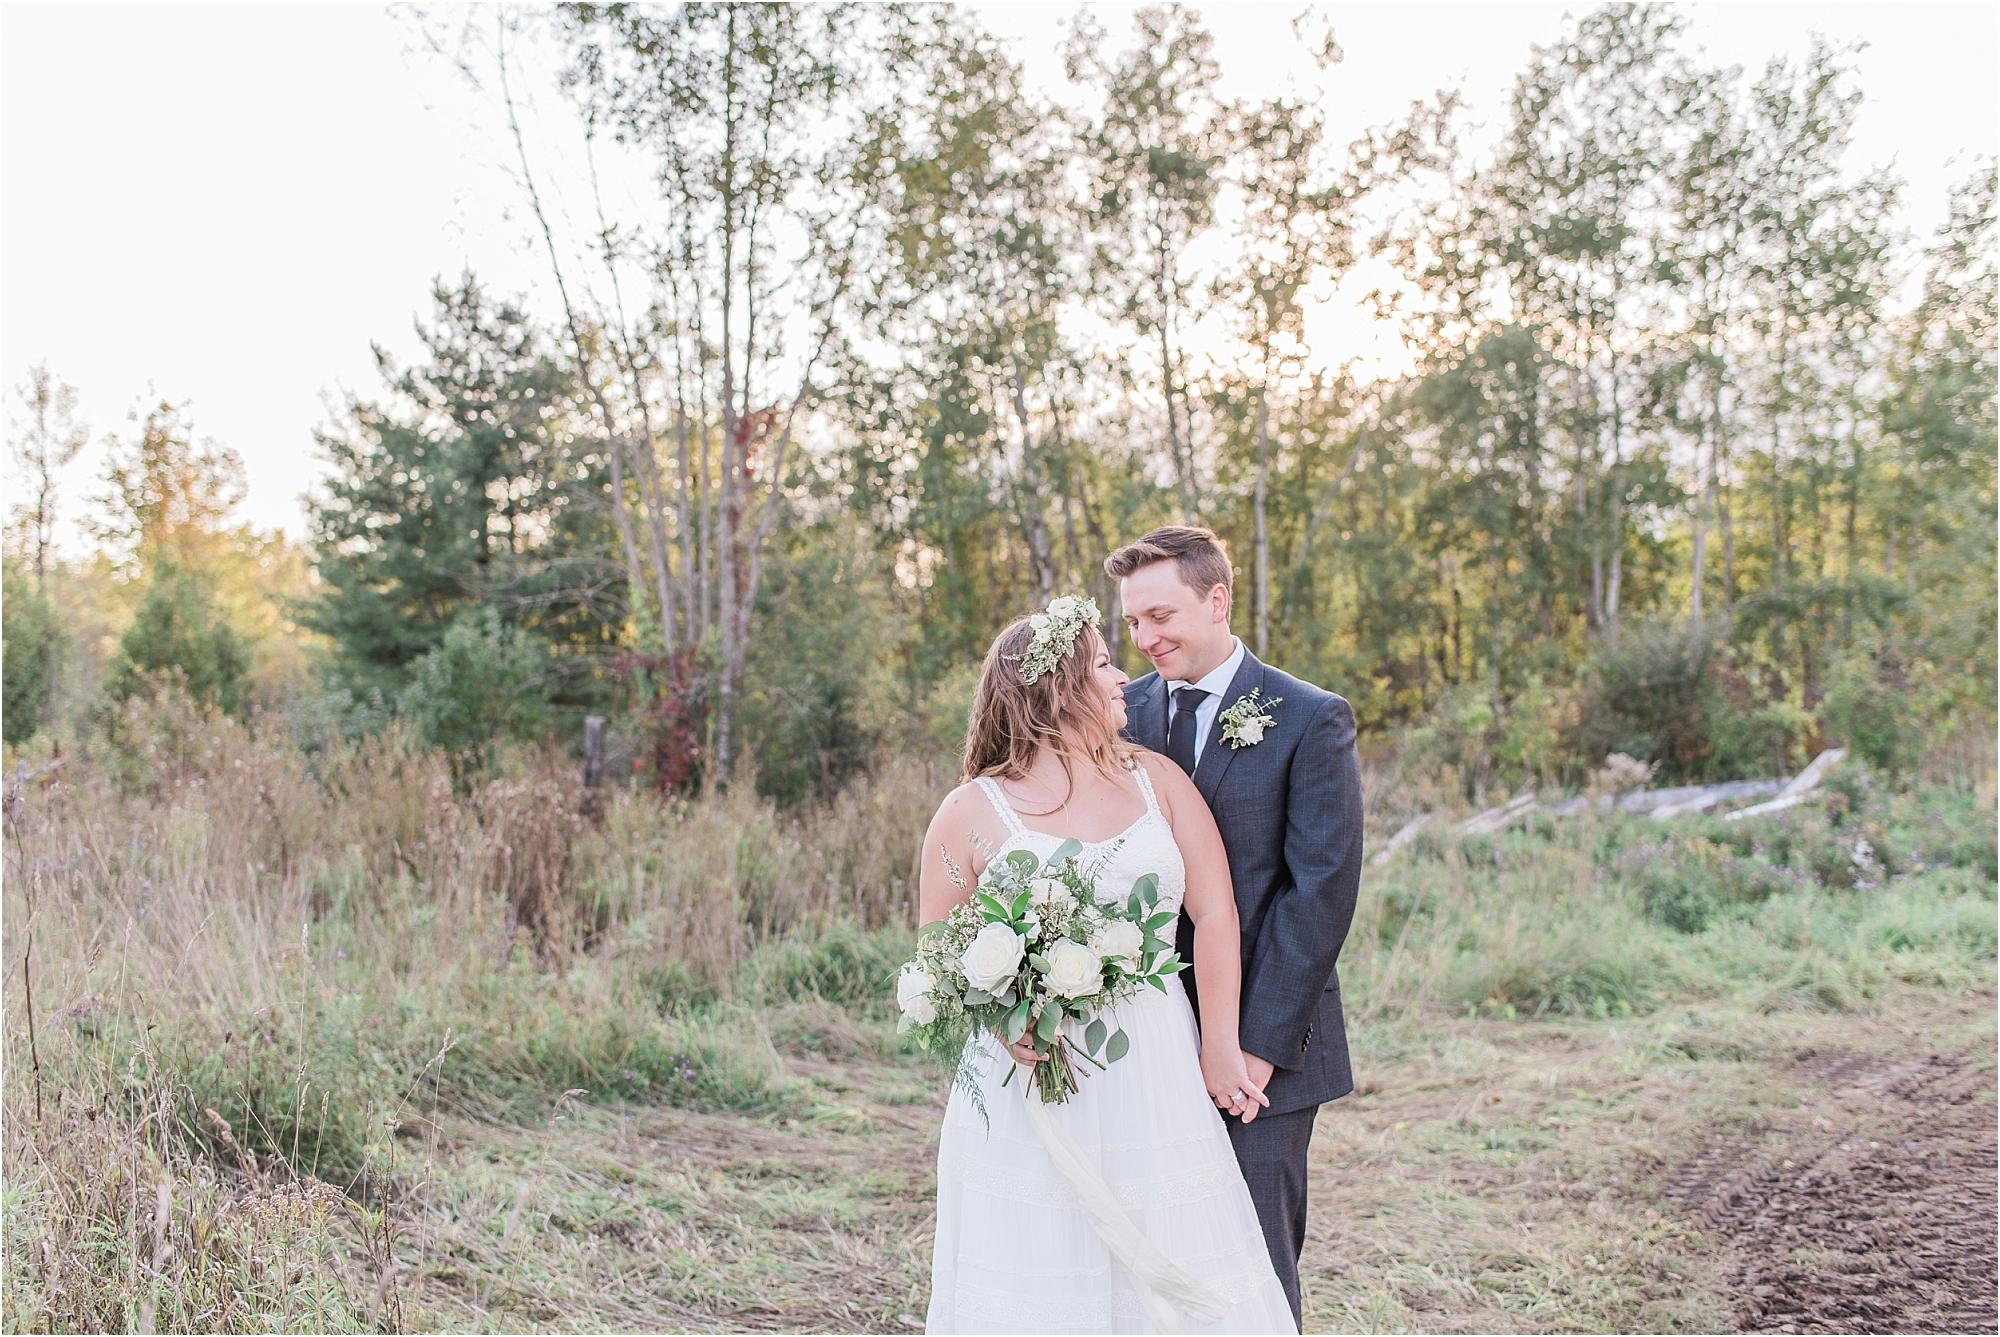 0094 Summer Stonefields Wedding Carleton Place - Ottawa Wedding - Photography by Emma_WEB.jpg